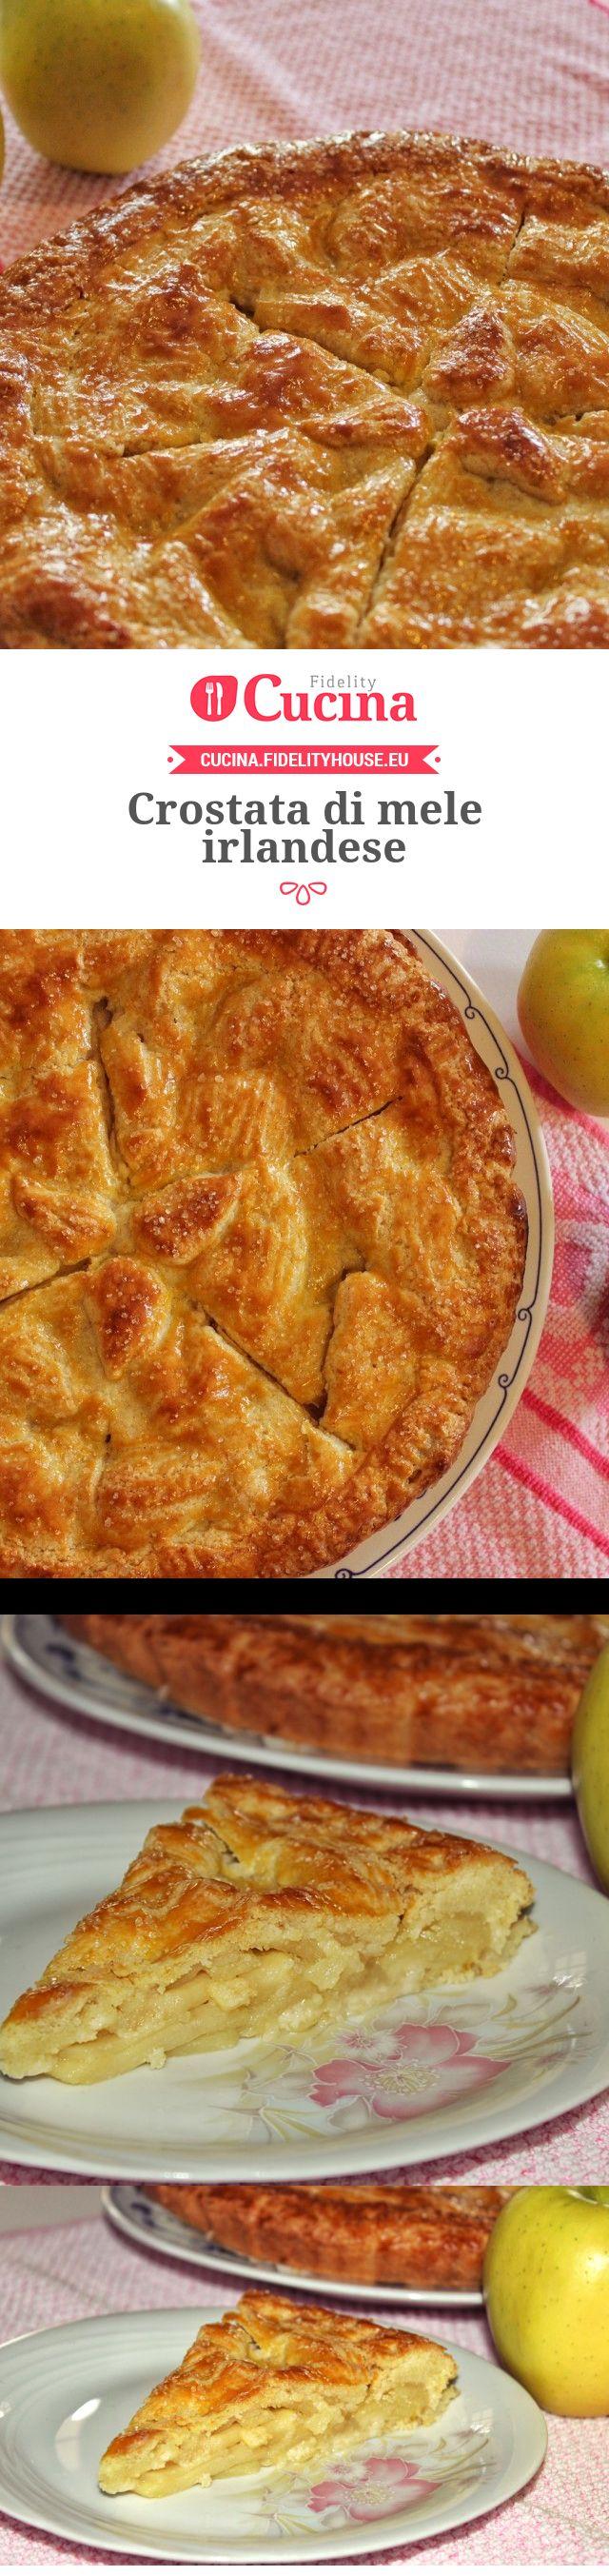 308 best torta di mele images on pinterest biscotti for Crostata di mele